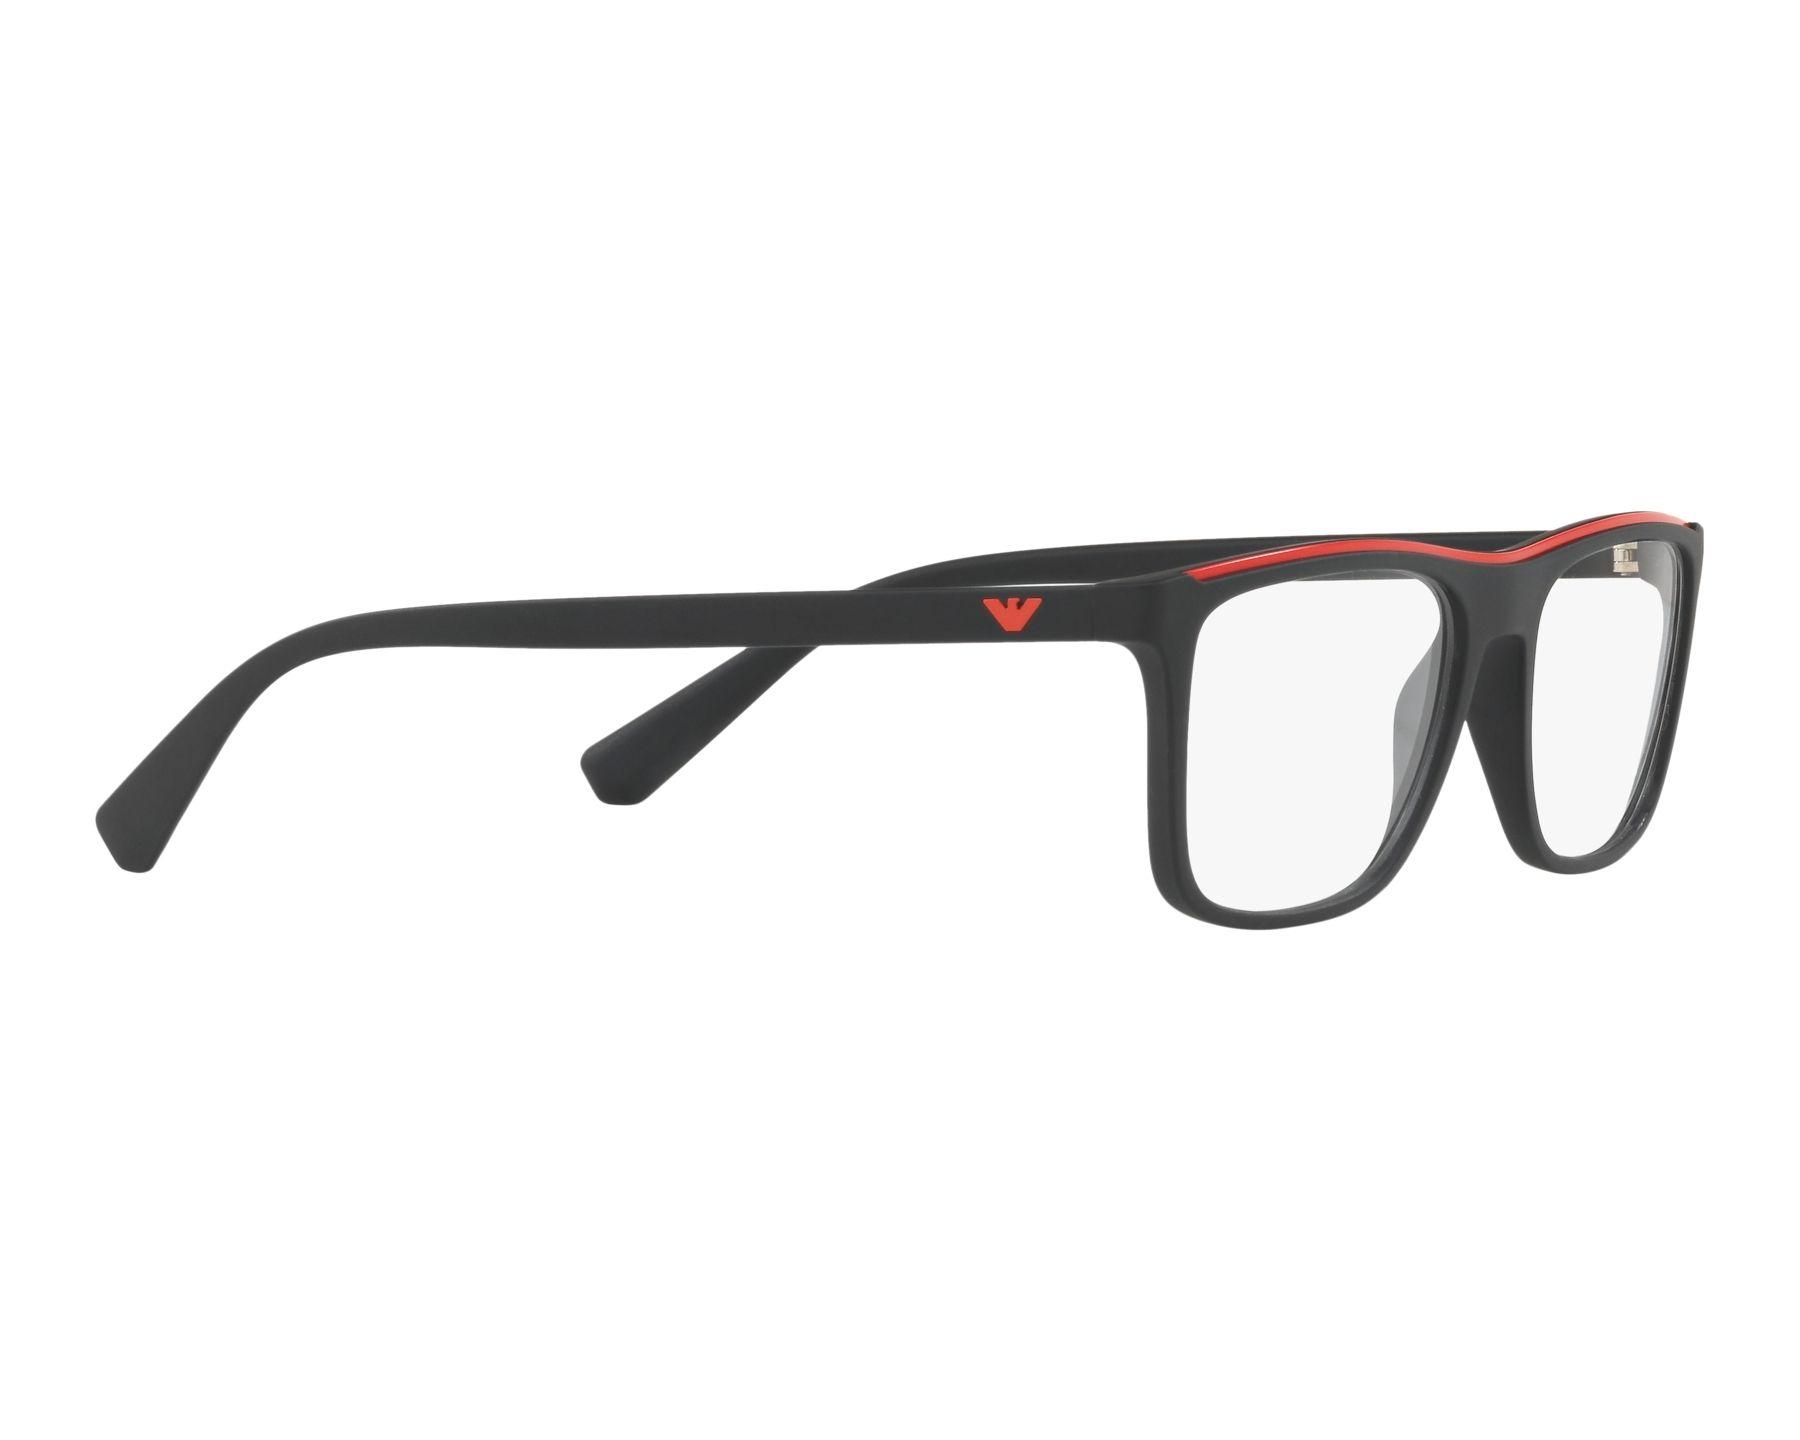 eyeglasses Emporio Armani EA-3124 5042 53-17 Black Red 360 degree view 11 4ede4755b6a0